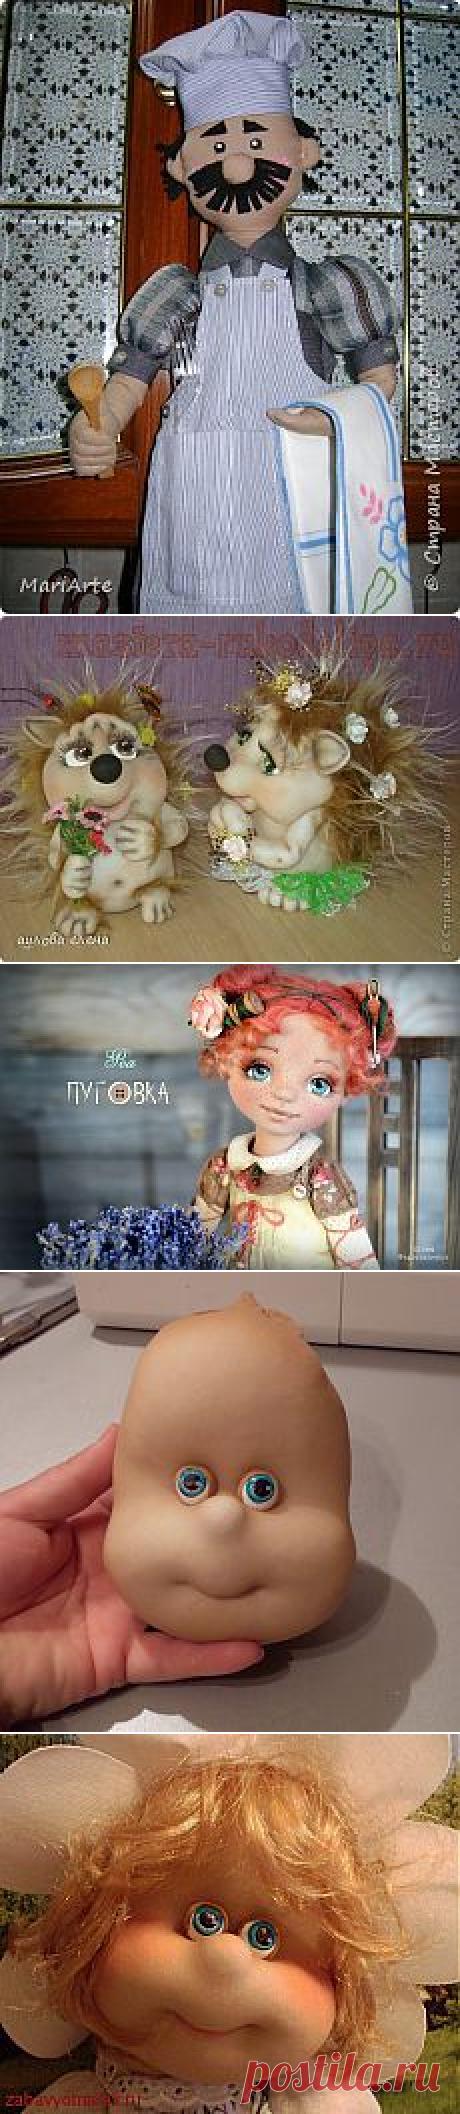 кукла | Ирина Наймановская | Фотографии и советы на Постиле